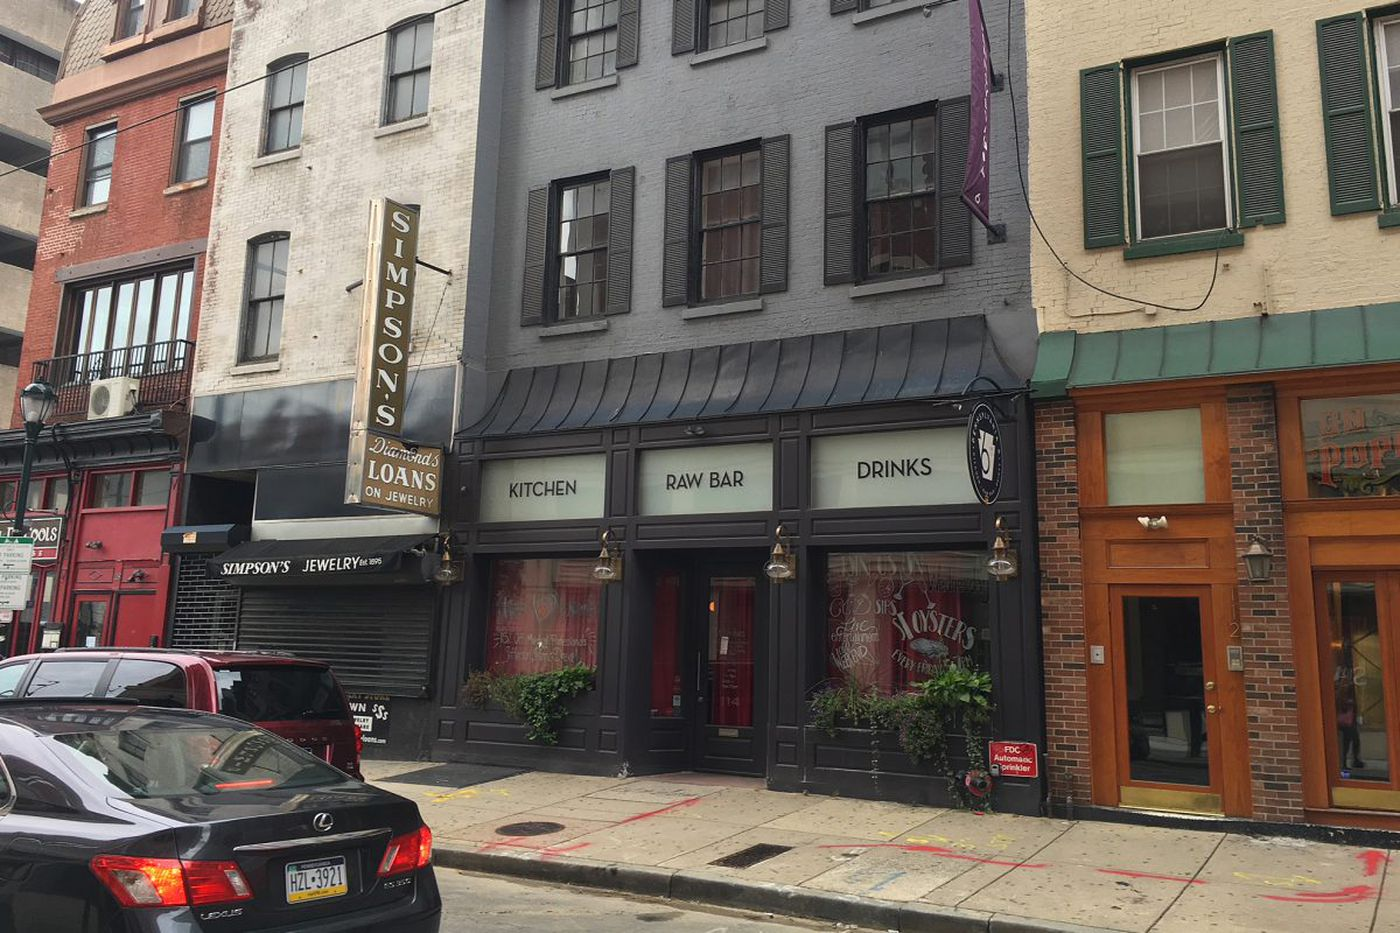 Pennsylvania 6 to get new life as a pub